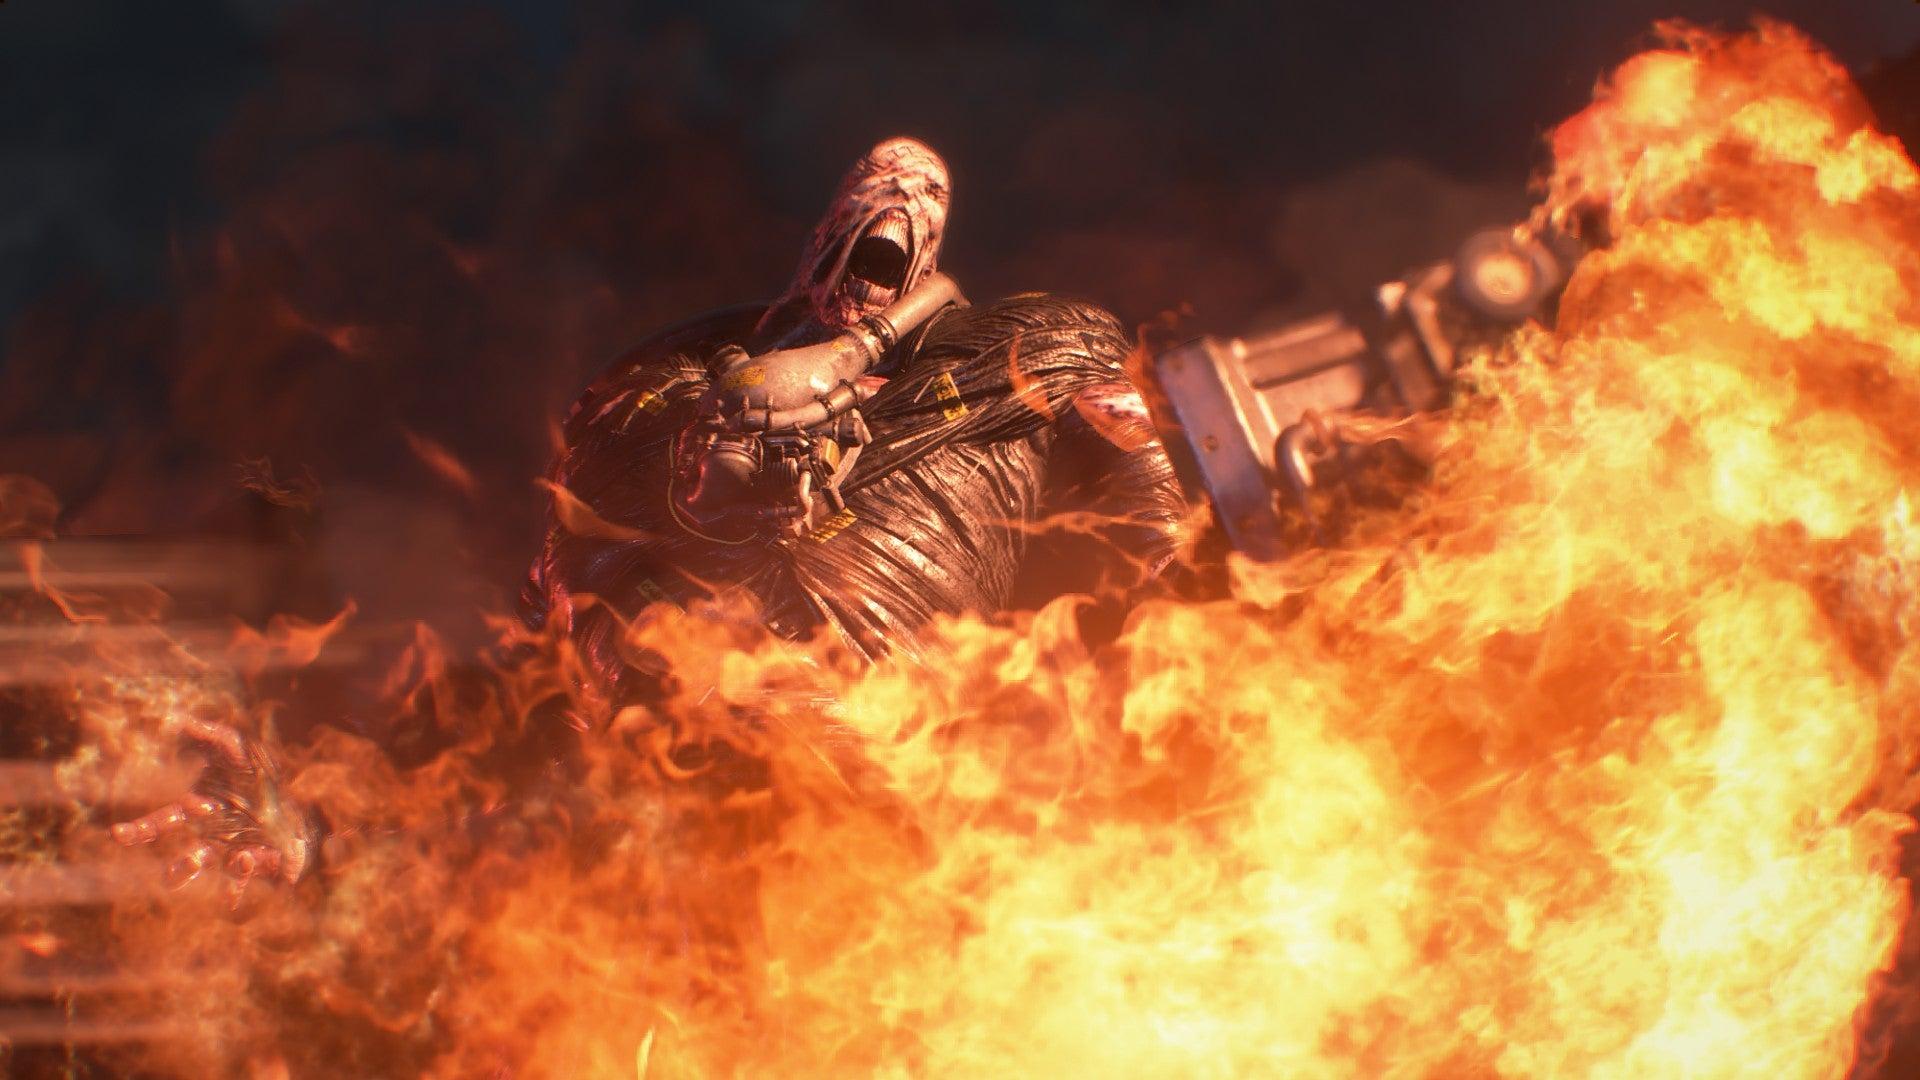 Image for Resident Evil 3 Remake: Demo, pre-order bonuses, gameplay and more